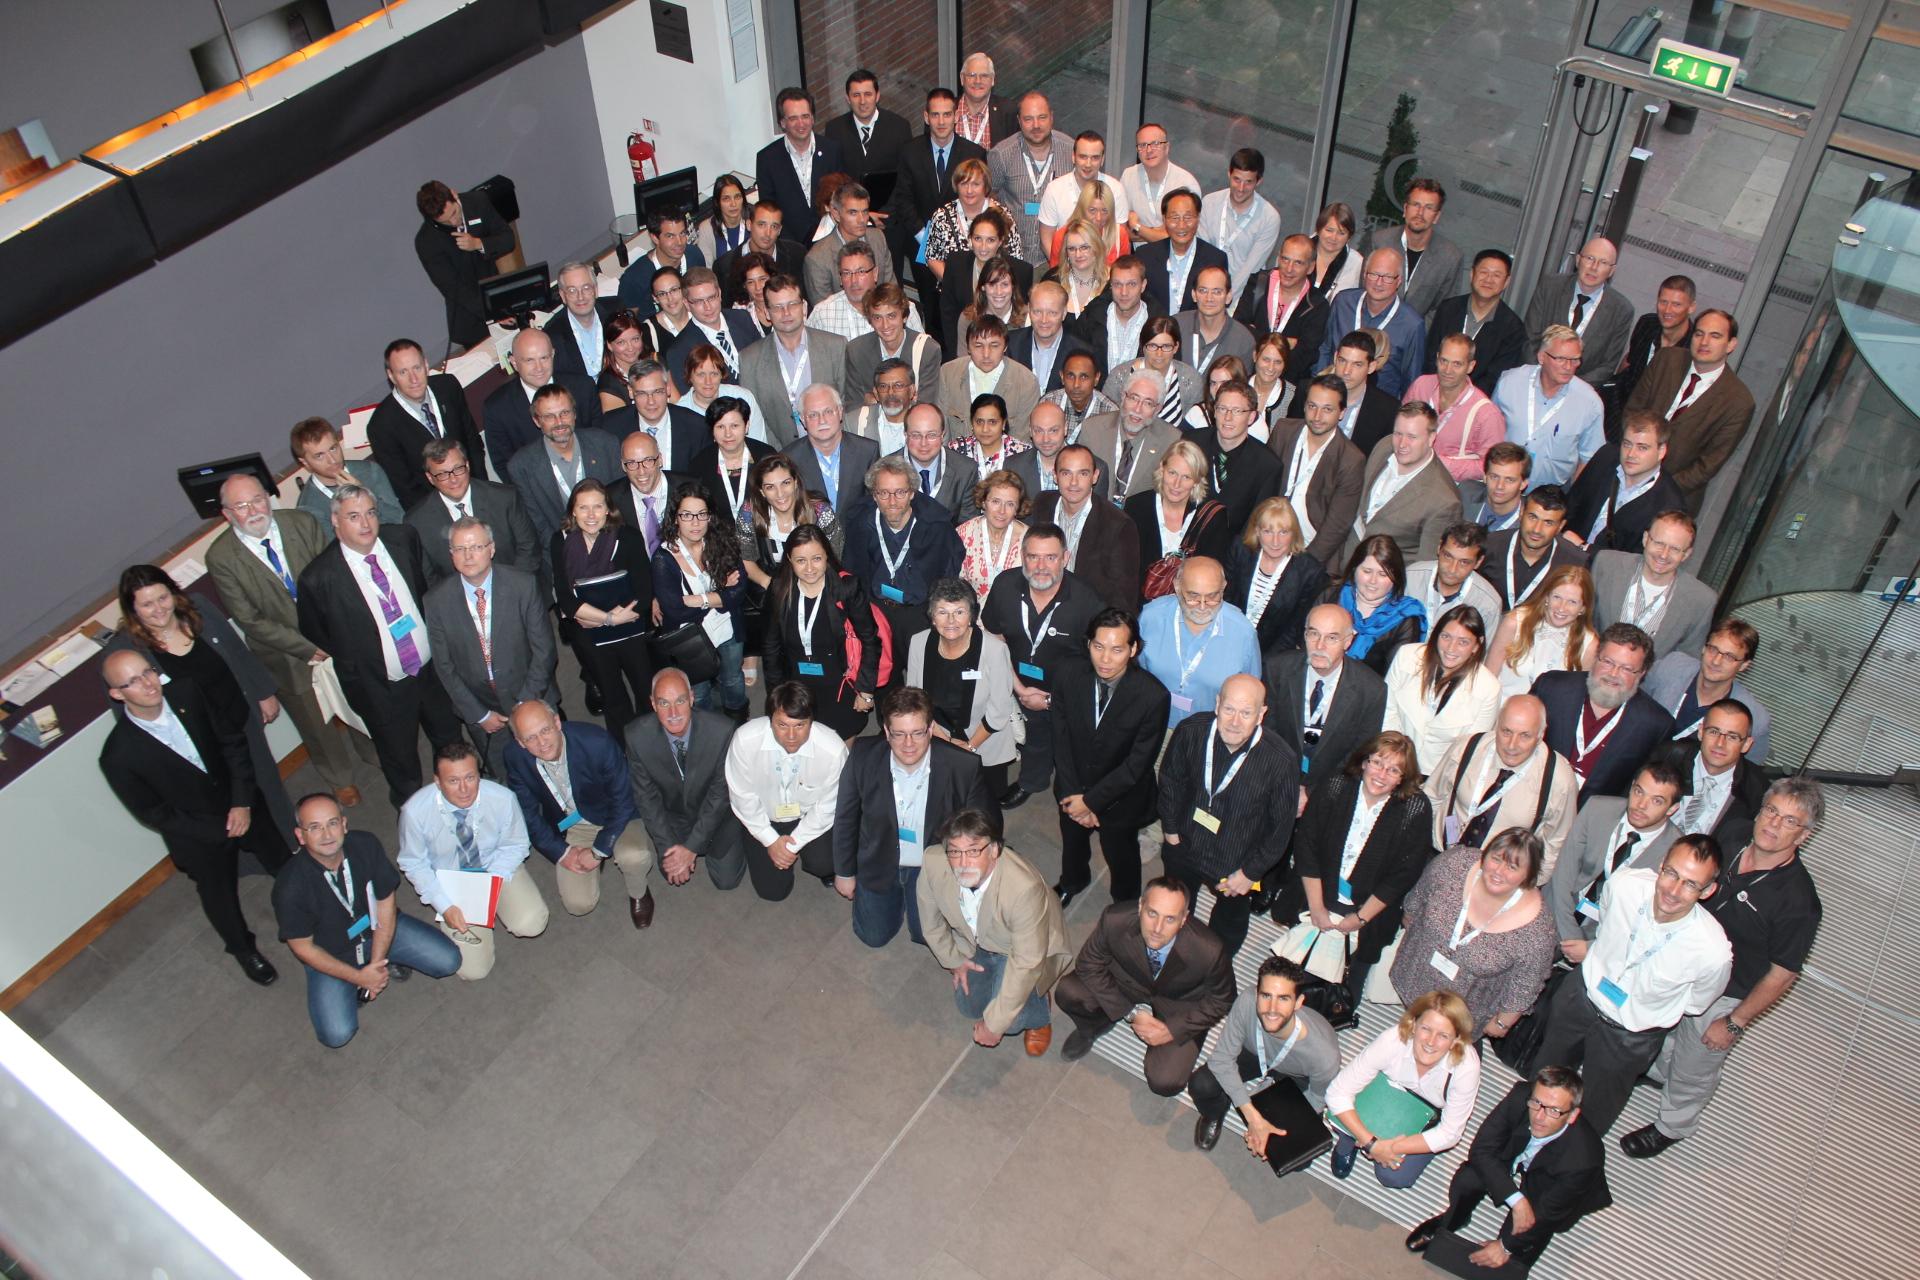 ENFSI Firearms/GSR Annual Meeting Group Photograph